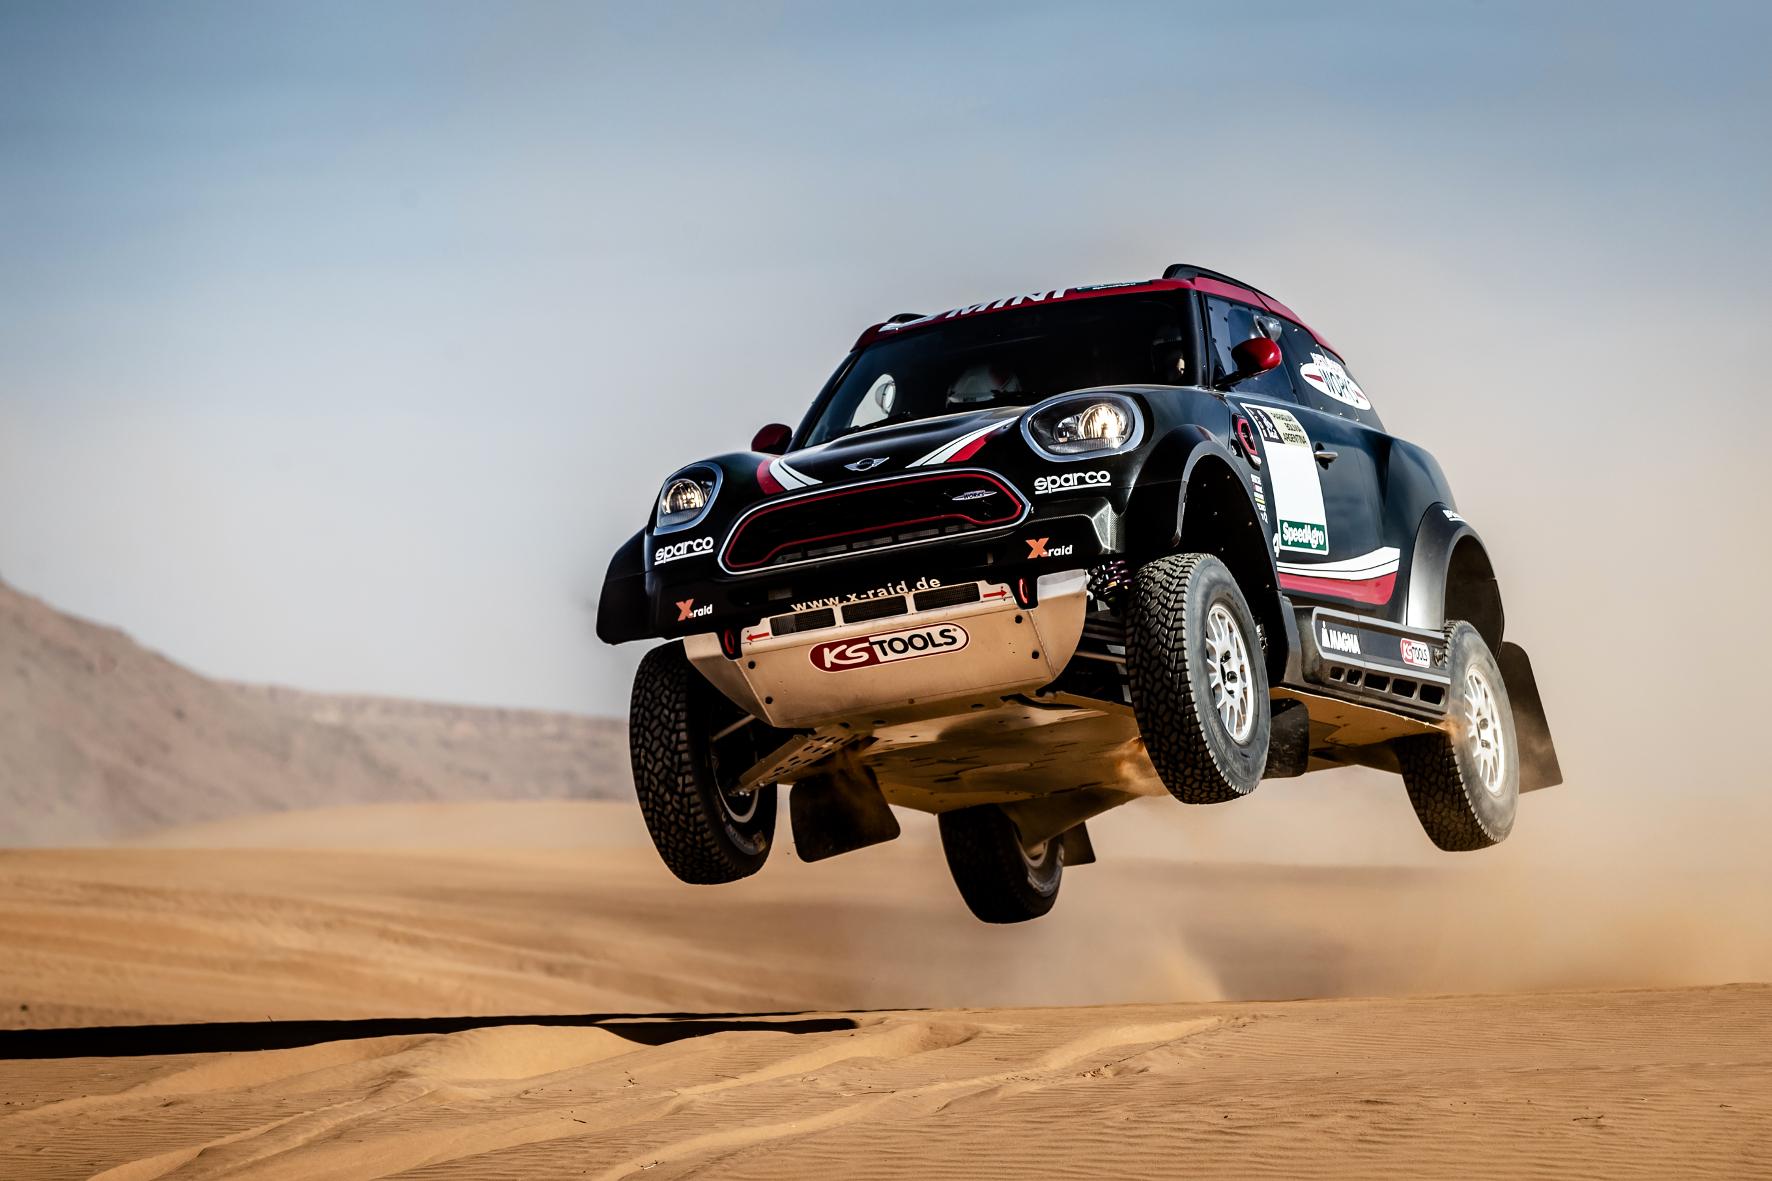 Mit dem neuen Mini John Cooper Works Rally will das X-raid-Team bei der Rally Dakar hoch hinaus.© X-raid / https://www.youtube.com/watch?v=x0S5TLATuFk / TRD Pressedienst